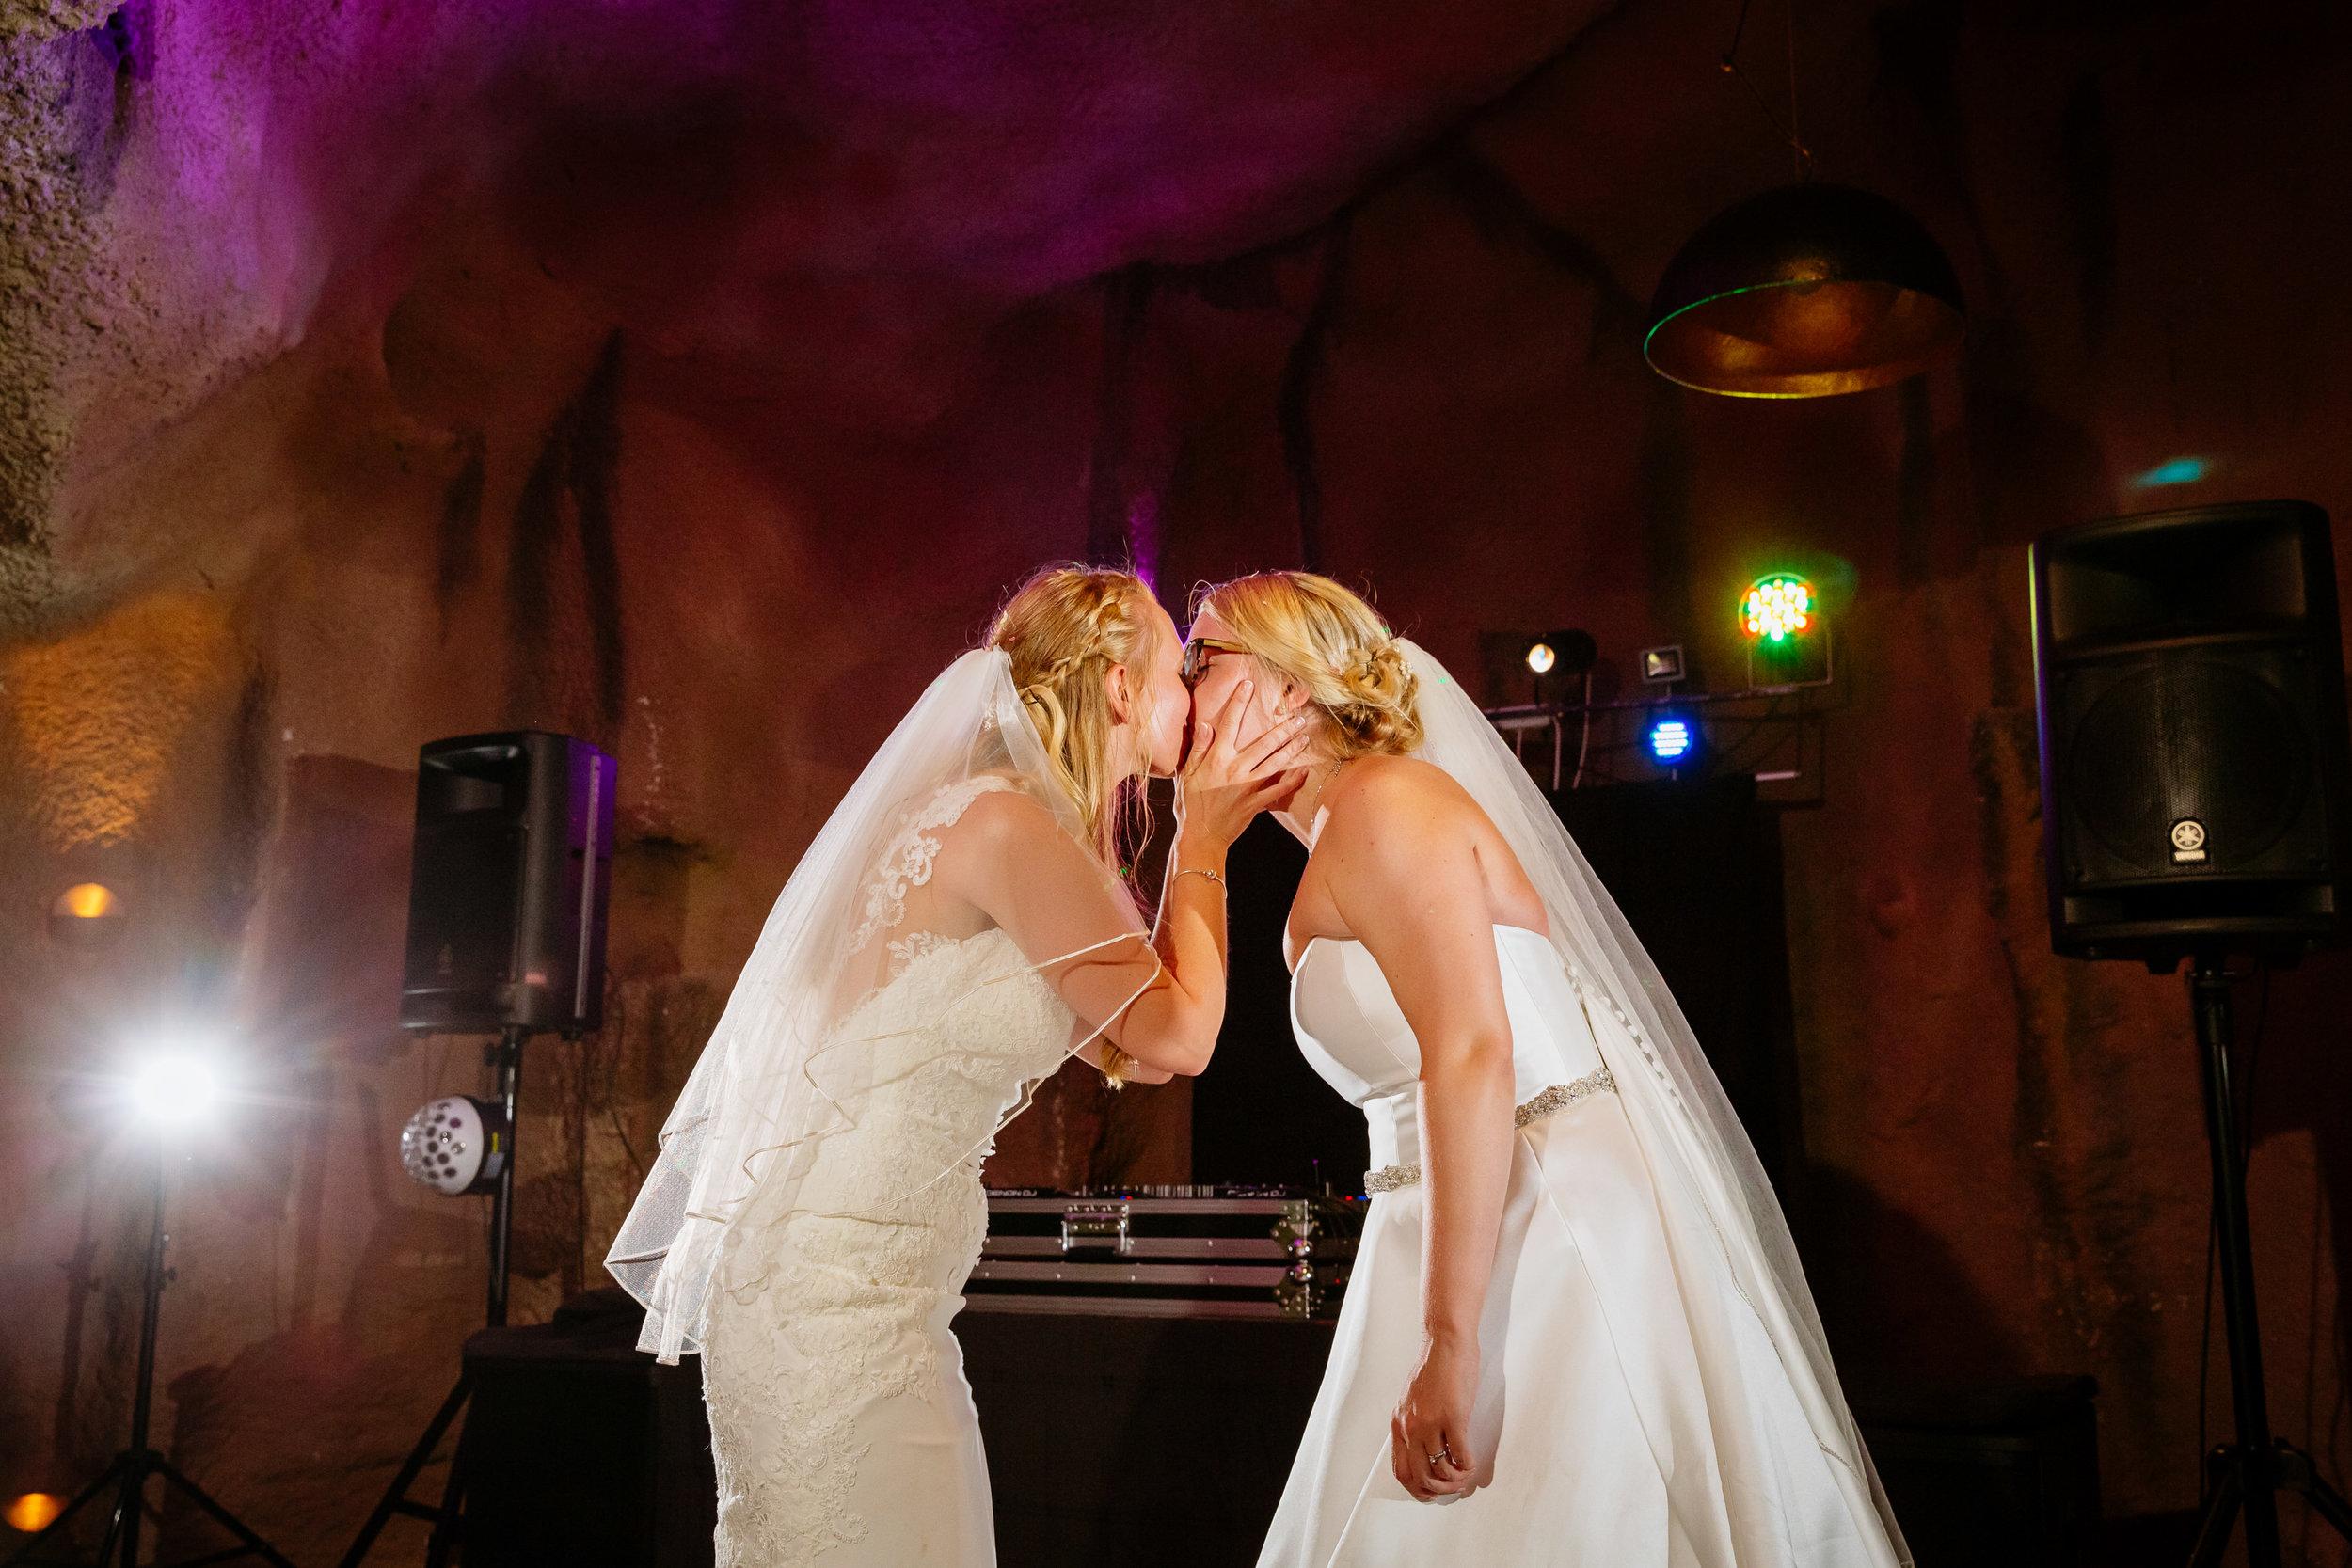 Malta_wedding_photography-118.jpg